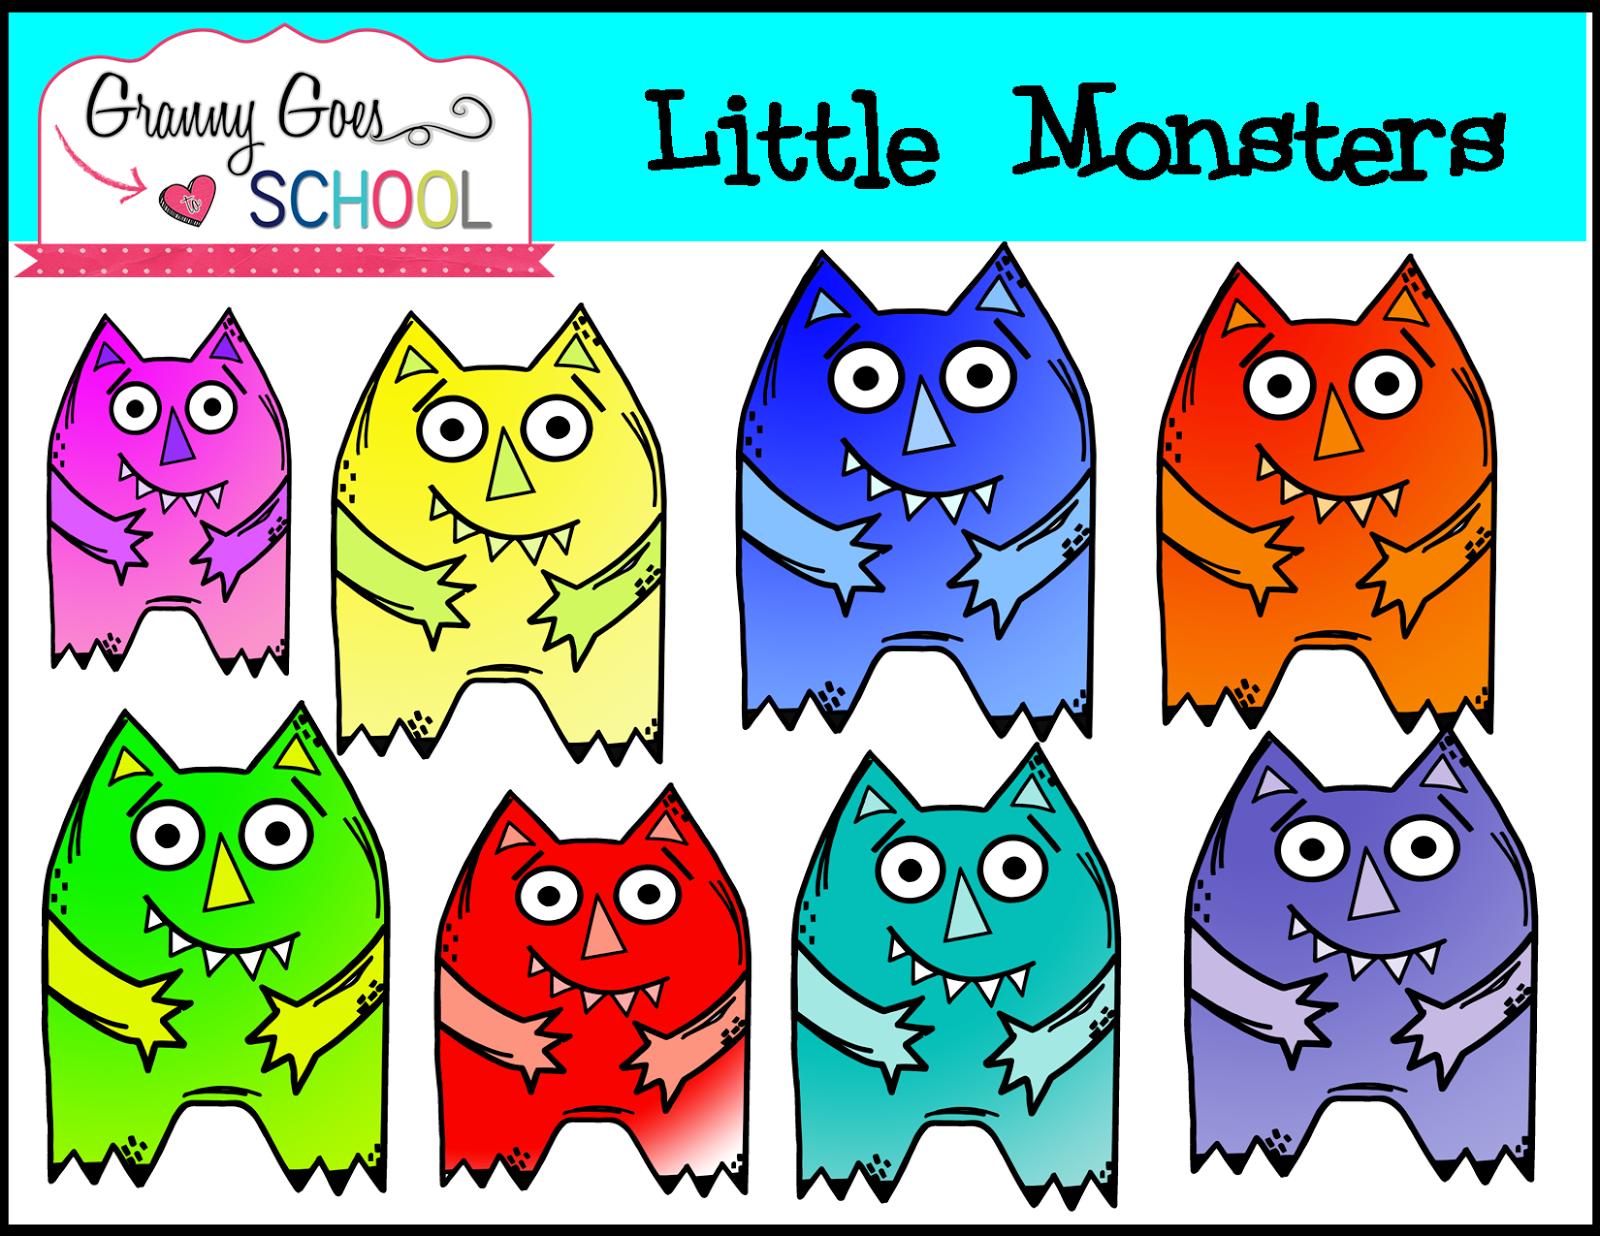 http://grannygoestoschool.blogspot.com/2014/09/little-monsters-freebie-clip-art.html